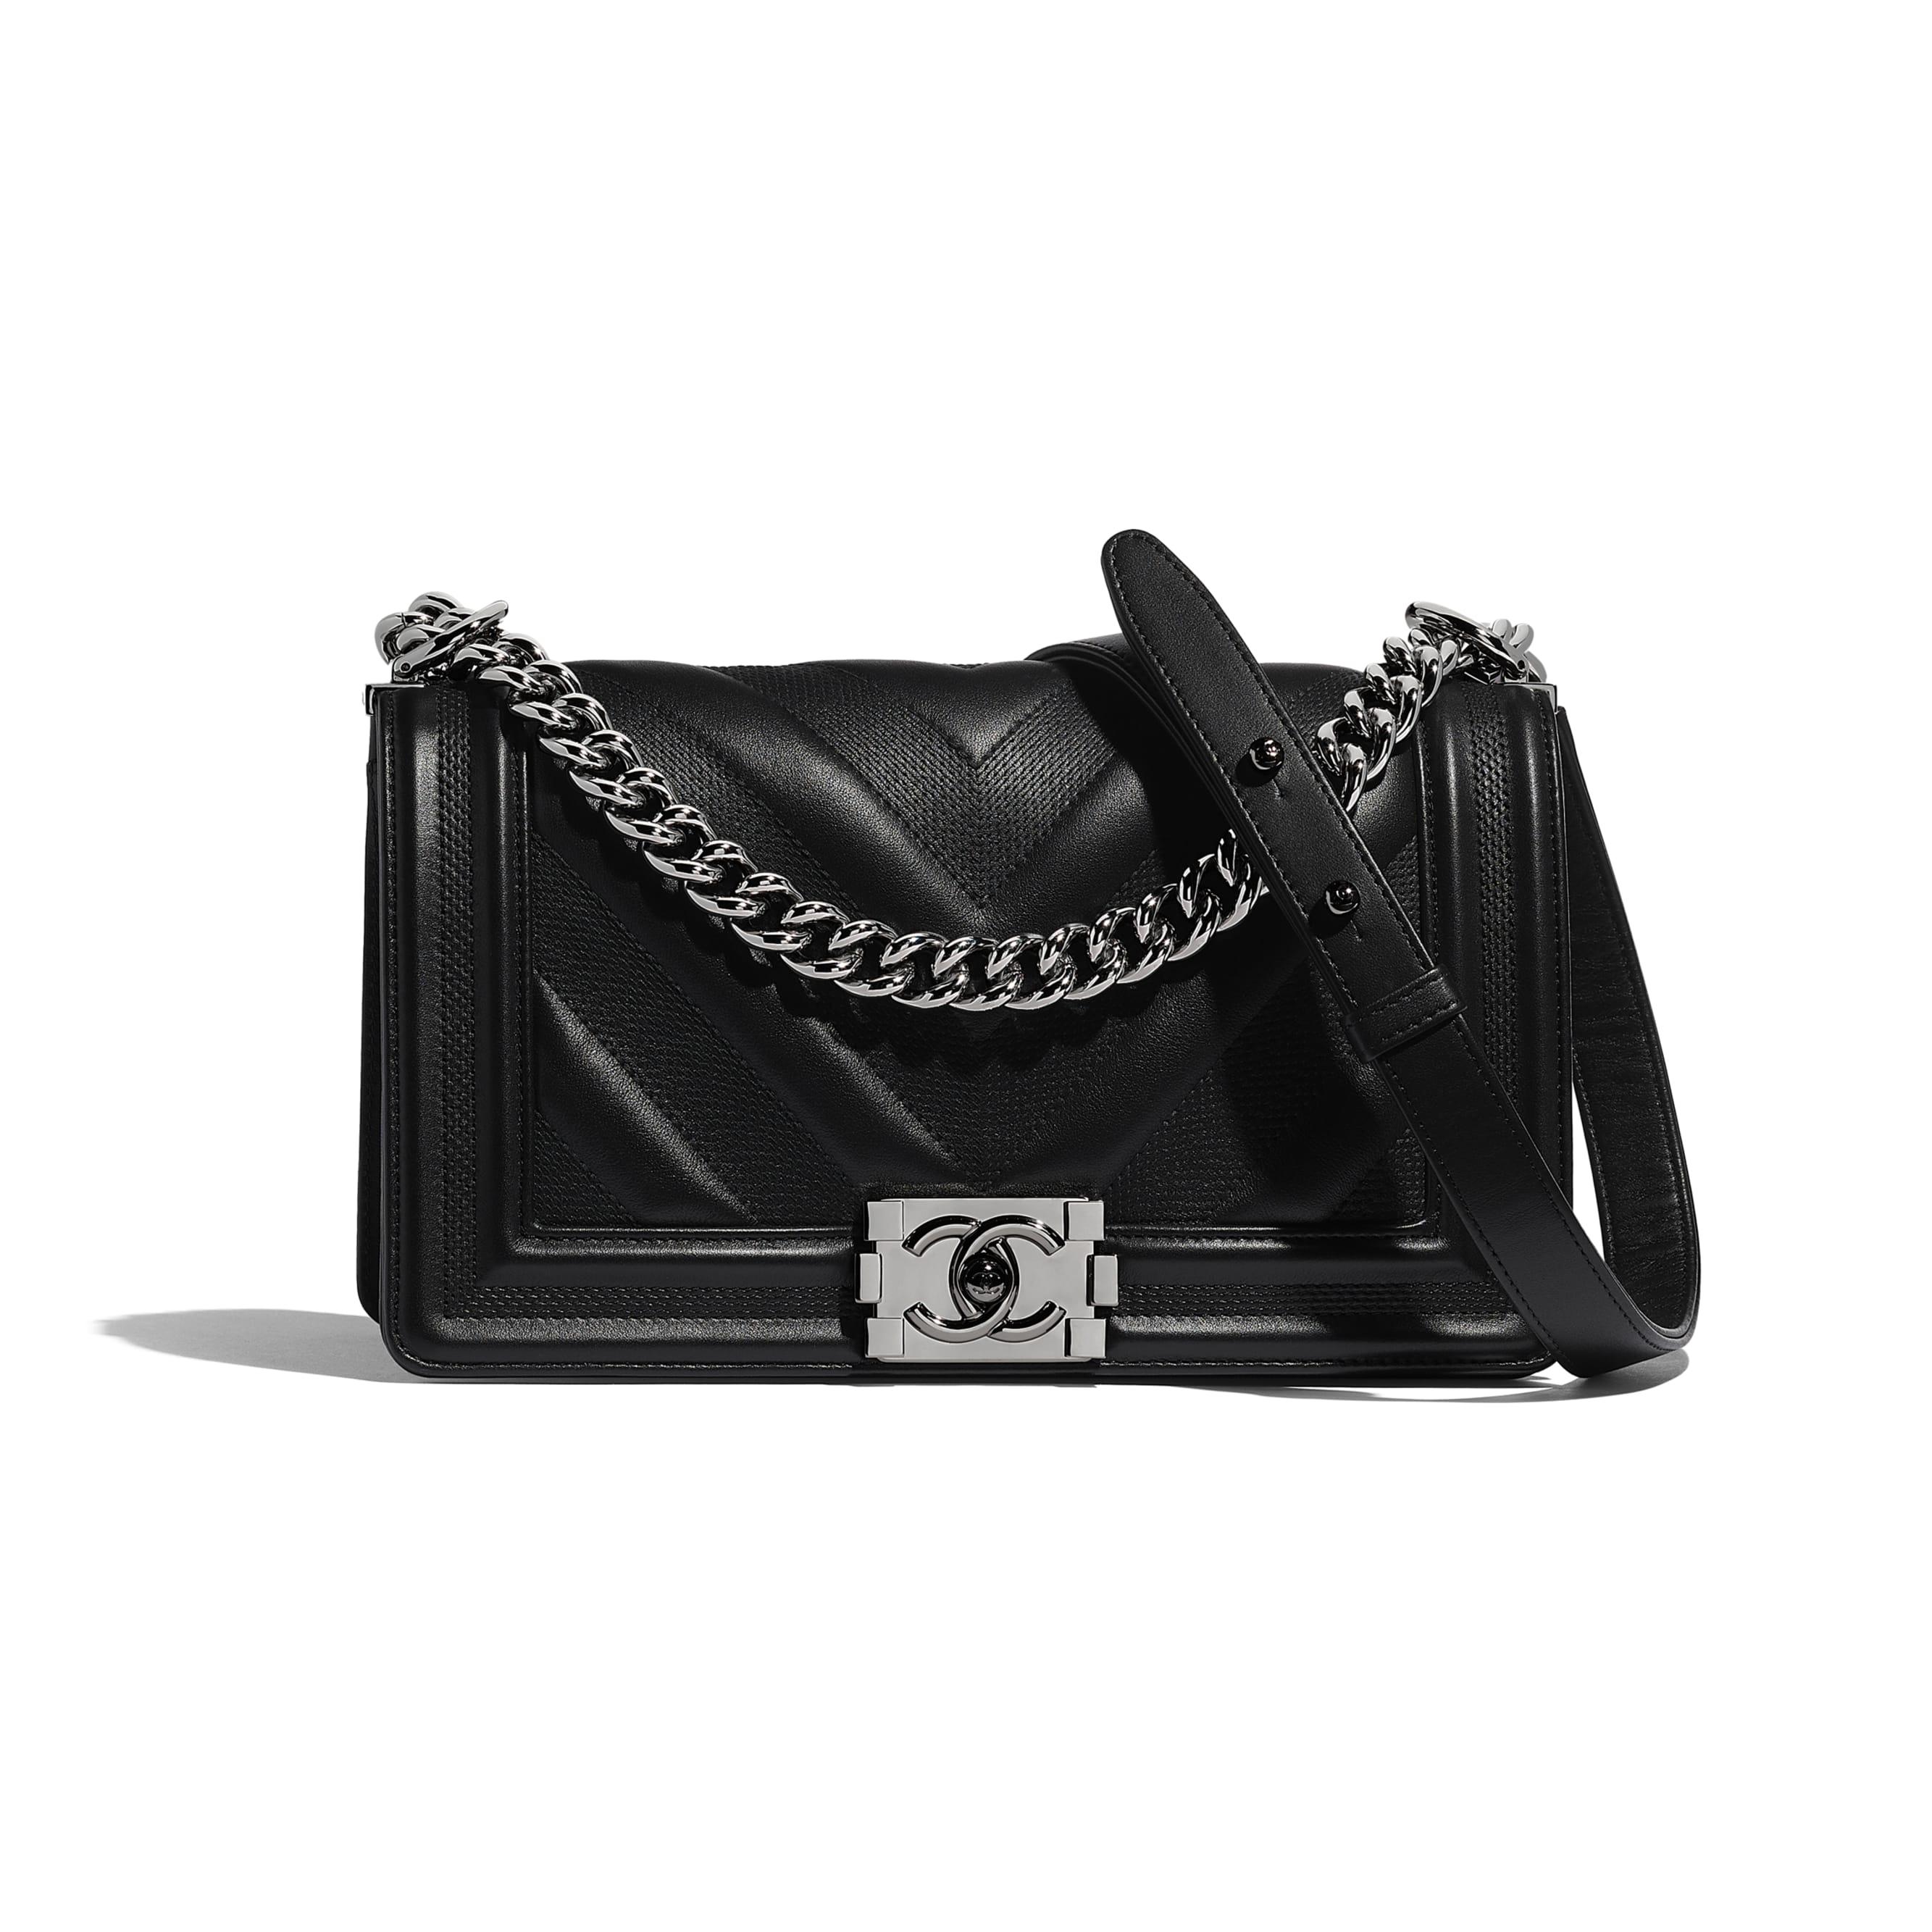 BOY CHANEL Handbag - Black - Calfskin & Ruthenium-Finish Metal - Default view - see standard sized version